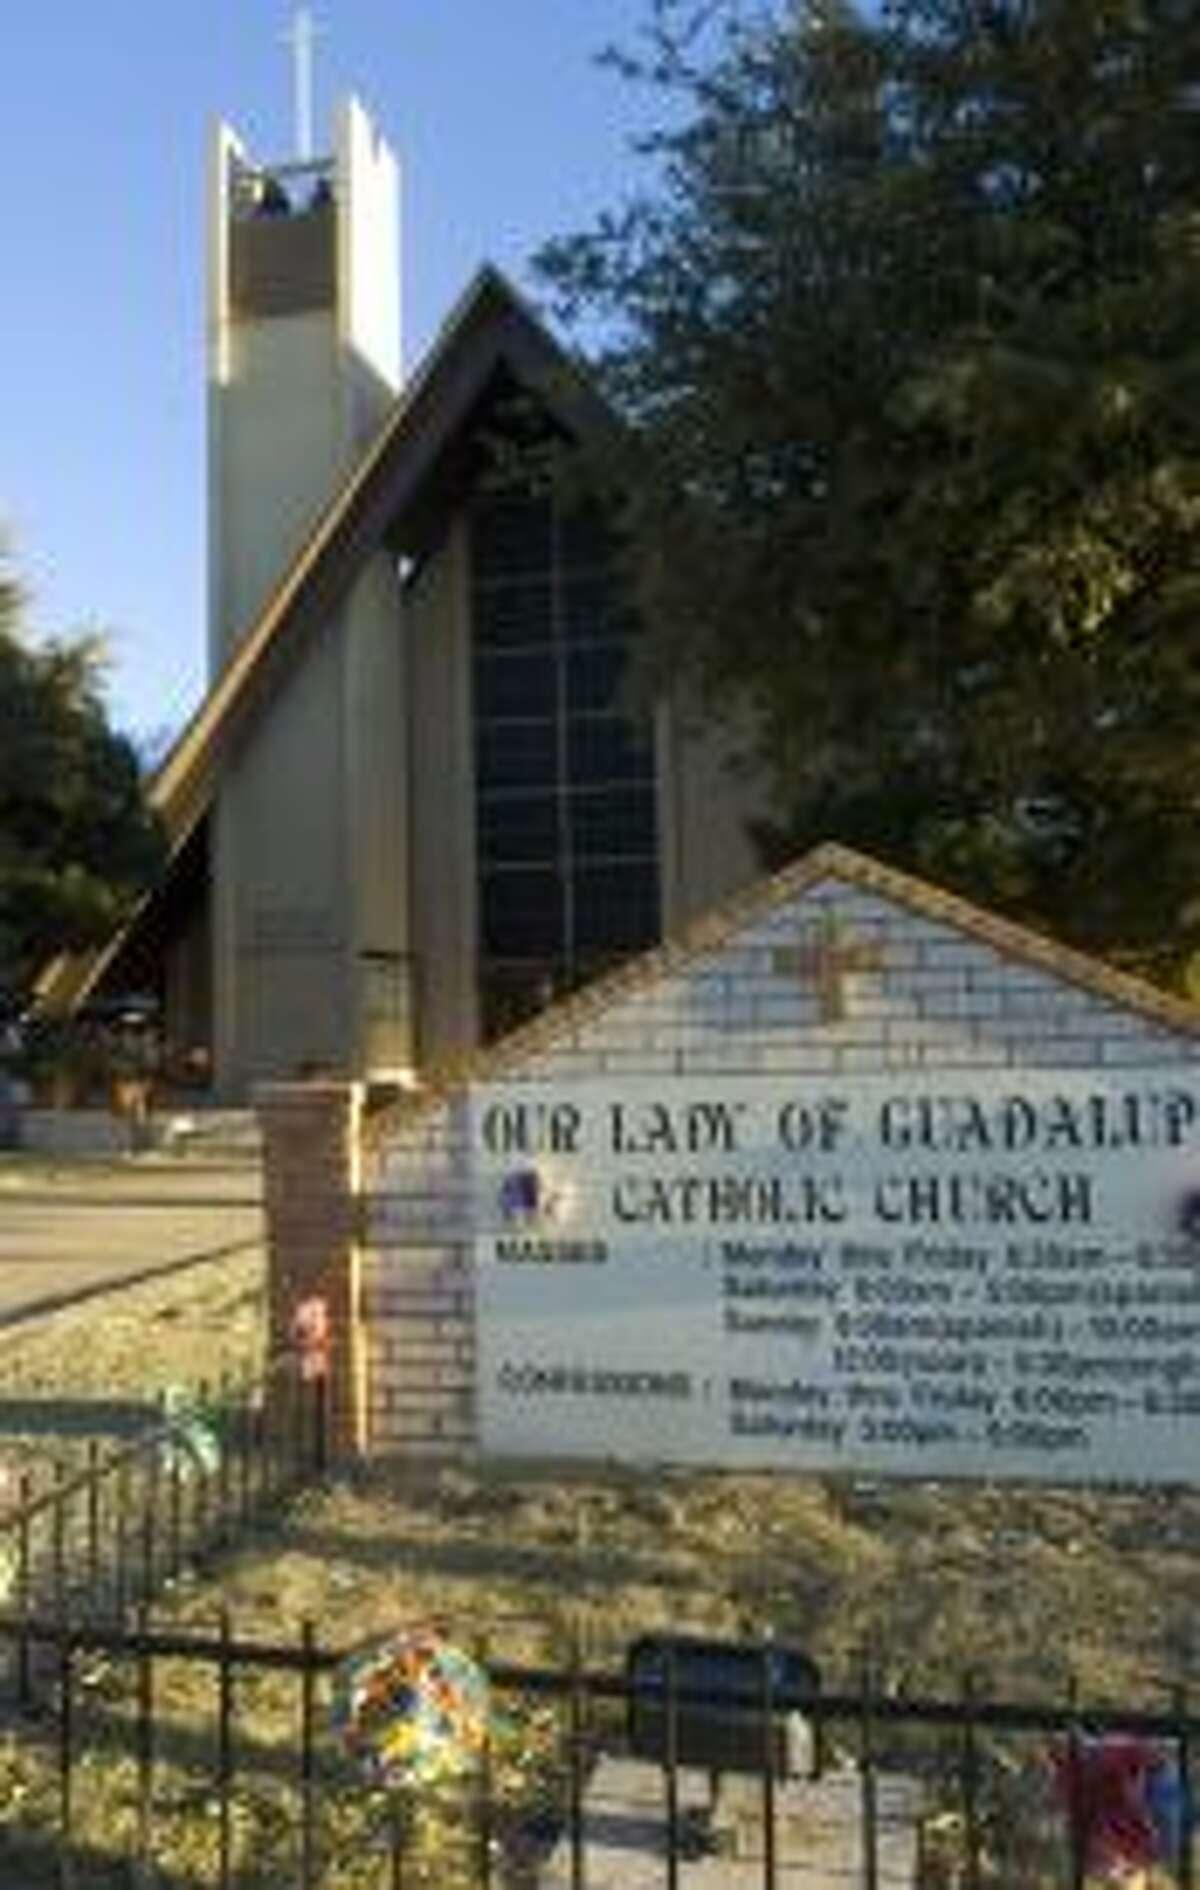 The church will host a Mardi Gras potluck dinner 5-8 p.m. Sunday at its parish hall.